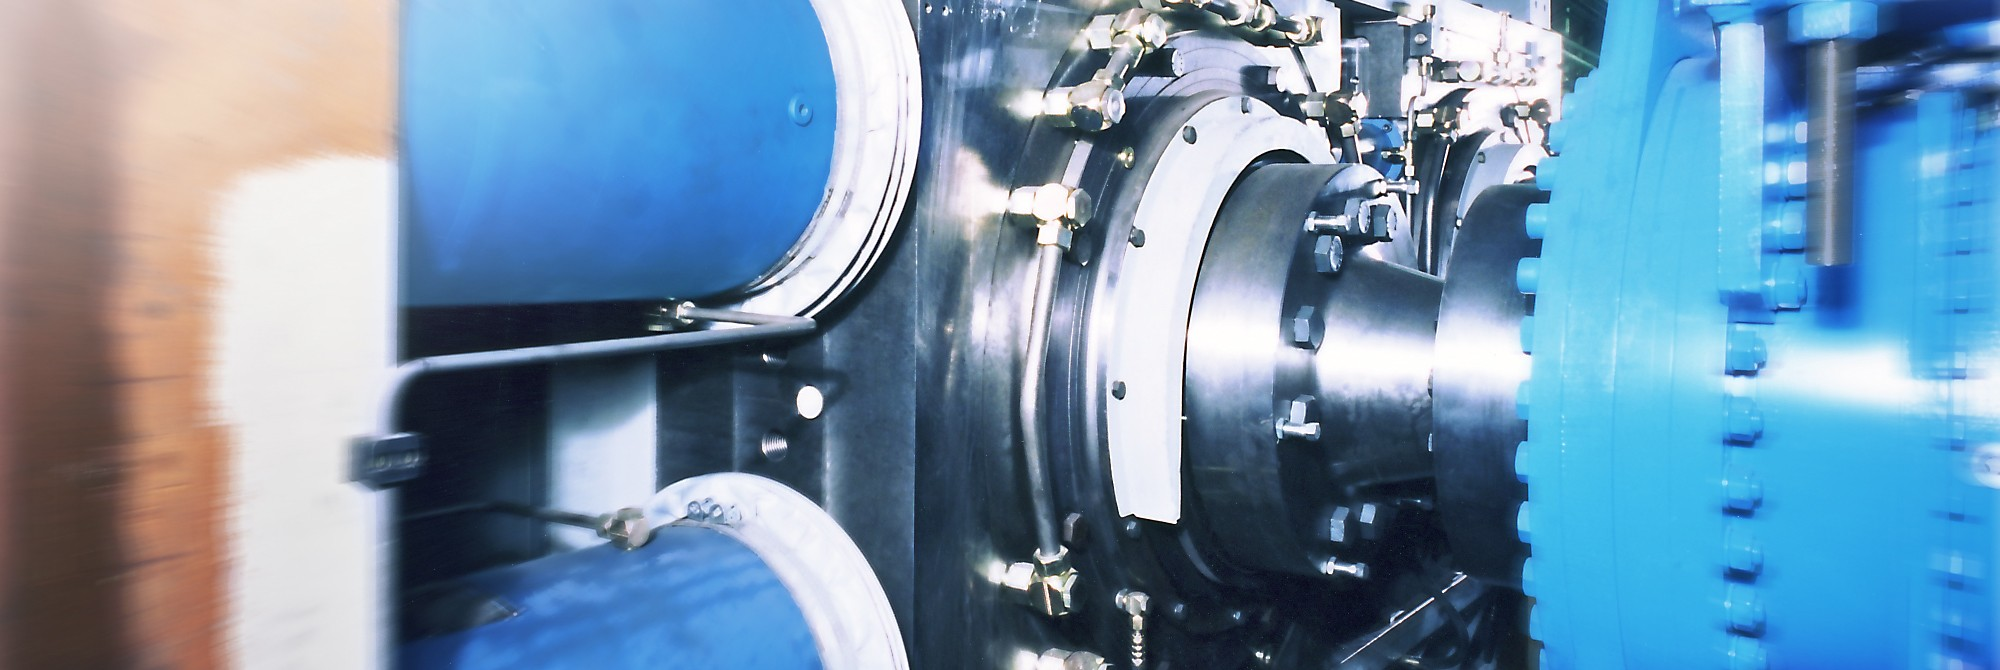 Grinding Polycom high pressure